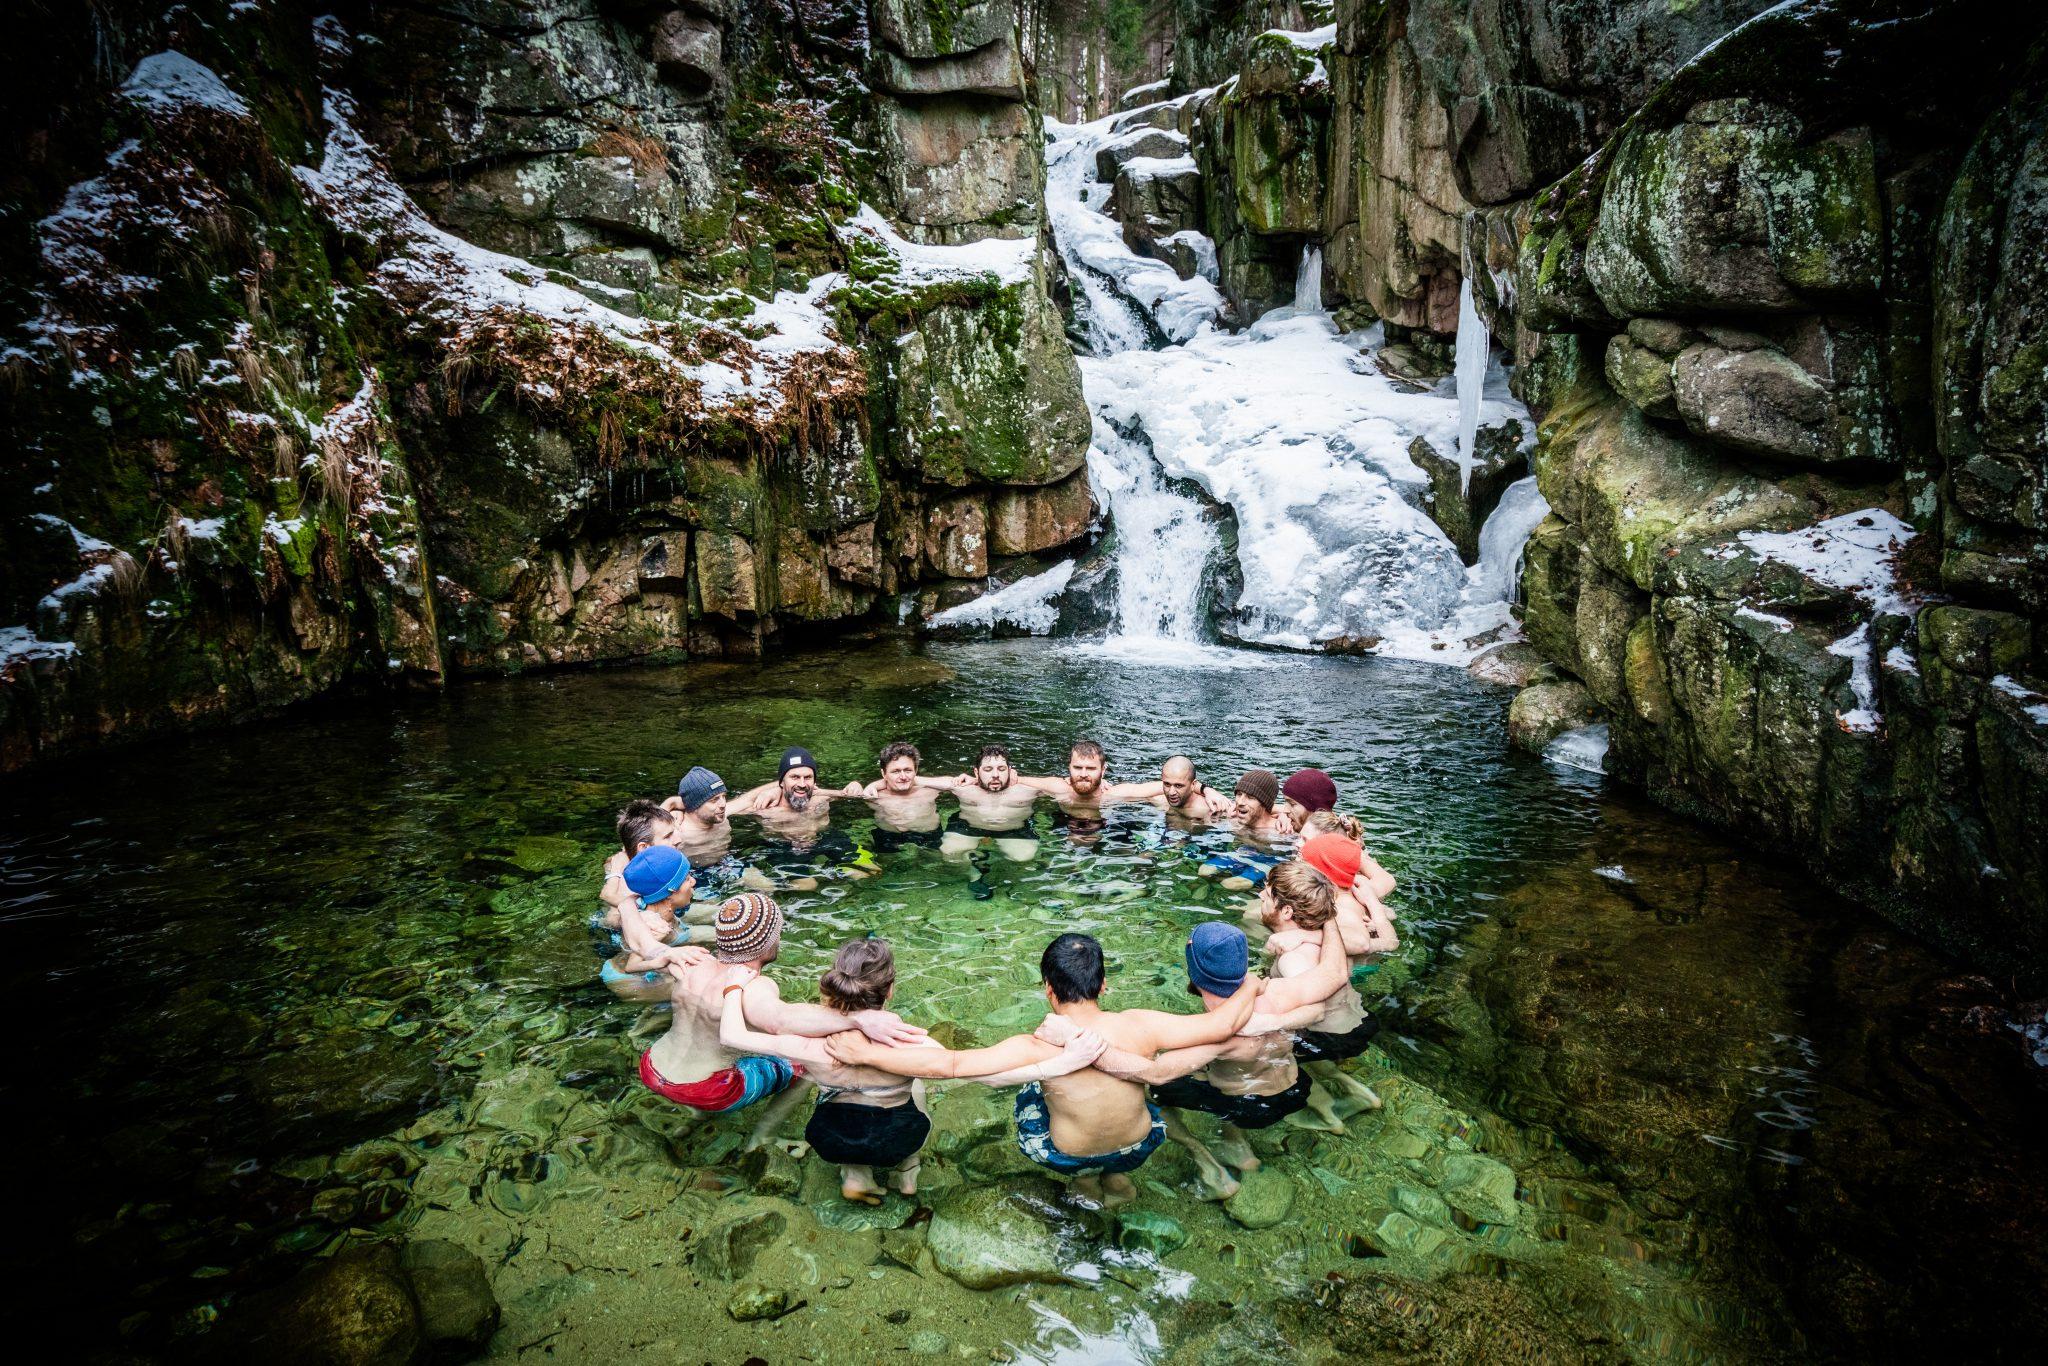 Wim Hof Method Winter Training Expedition Poland - Februari 2019